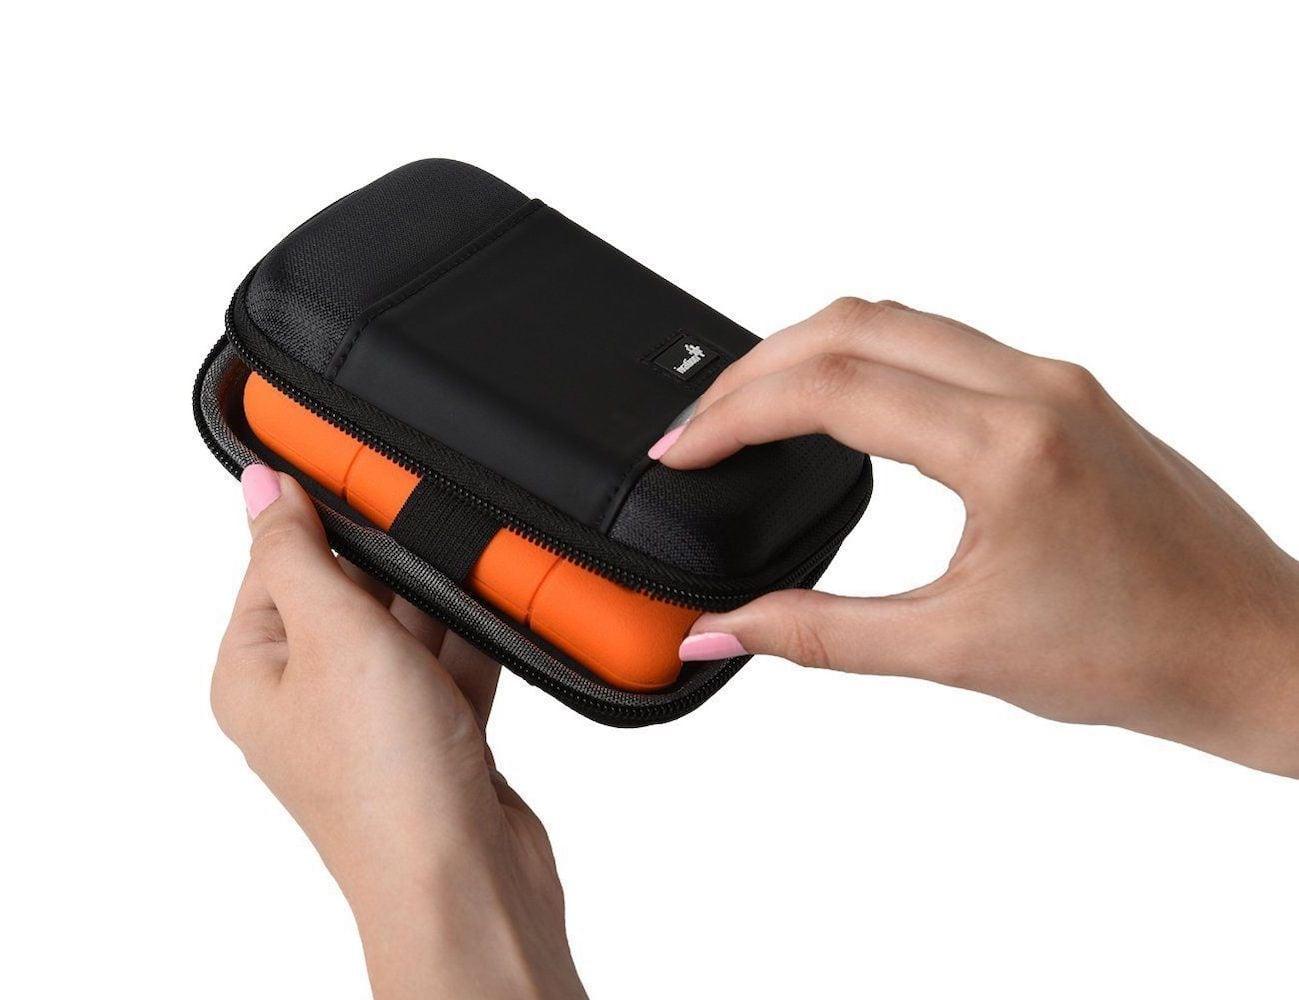 Lacie Rugged Mini Portable Hard Drive Keeps Your Data Safe